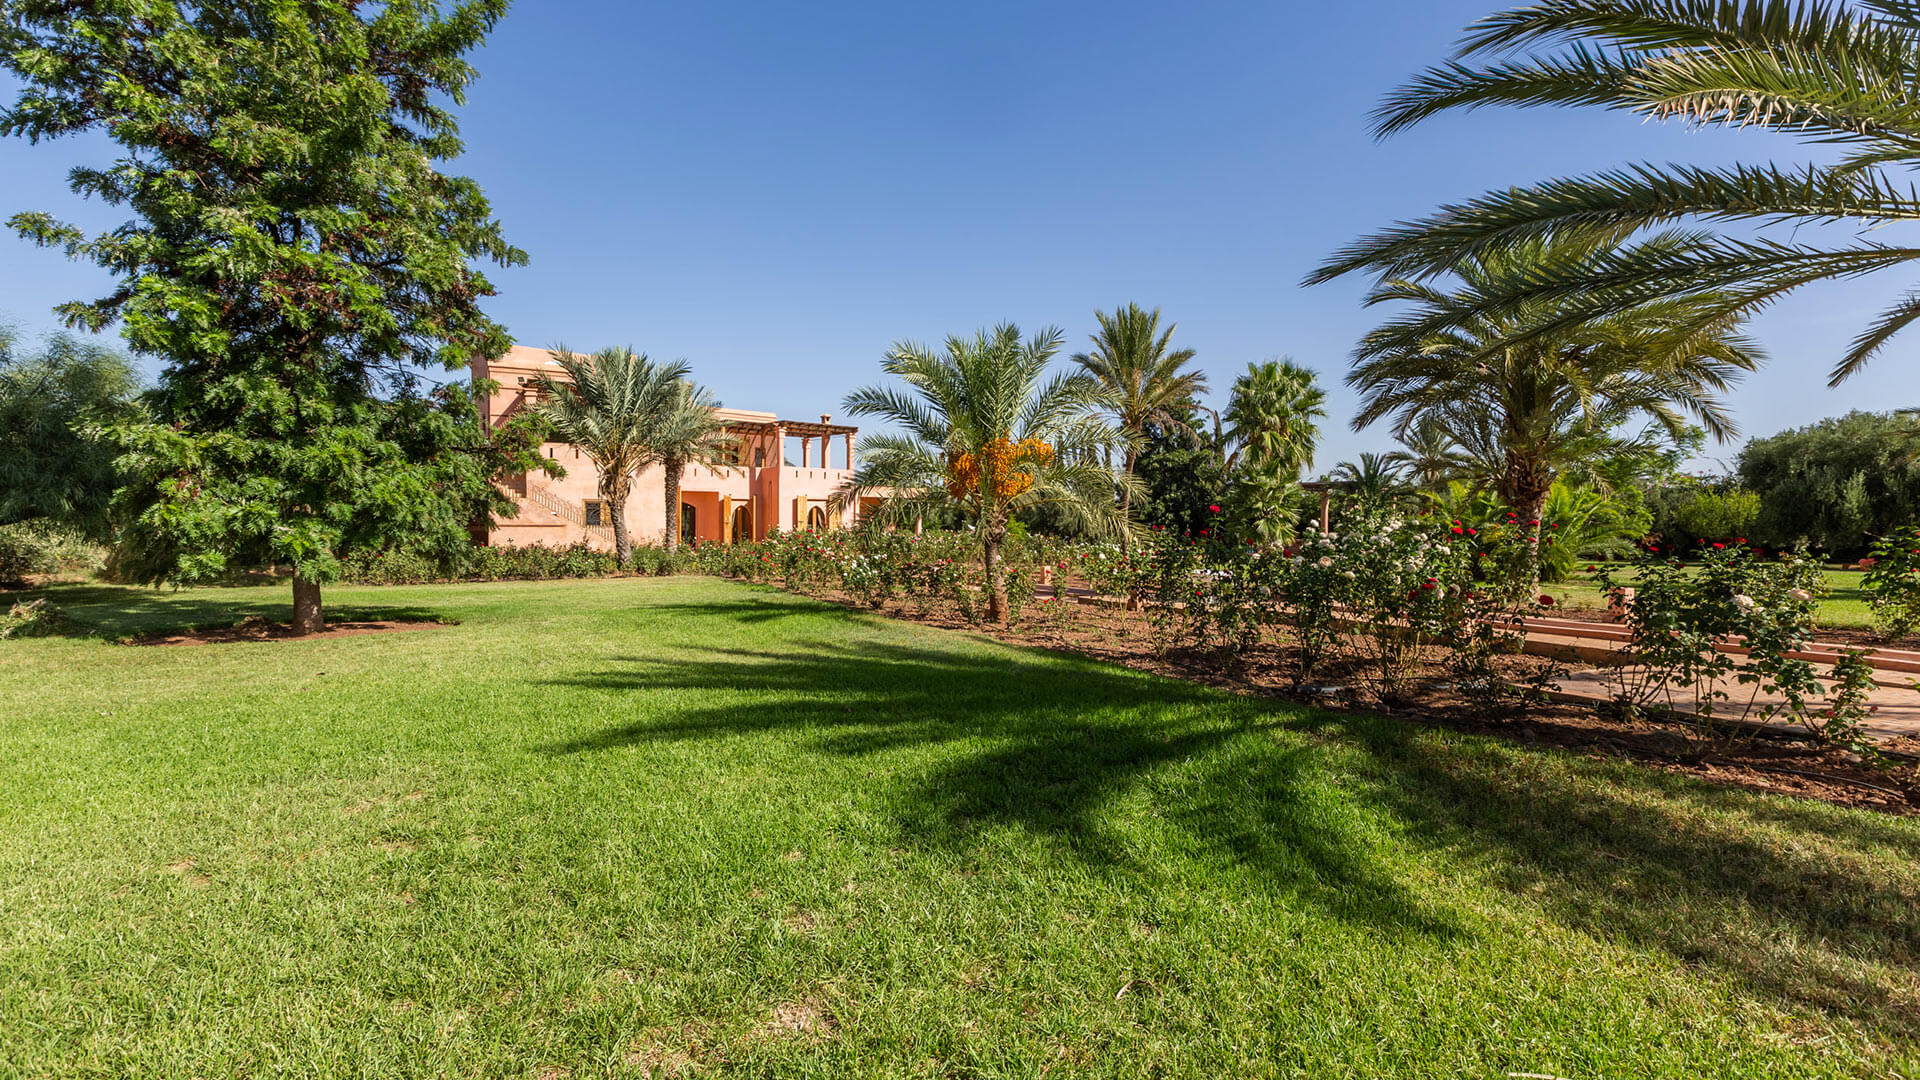 Villa Villa Prisma, Rental in Marrakech